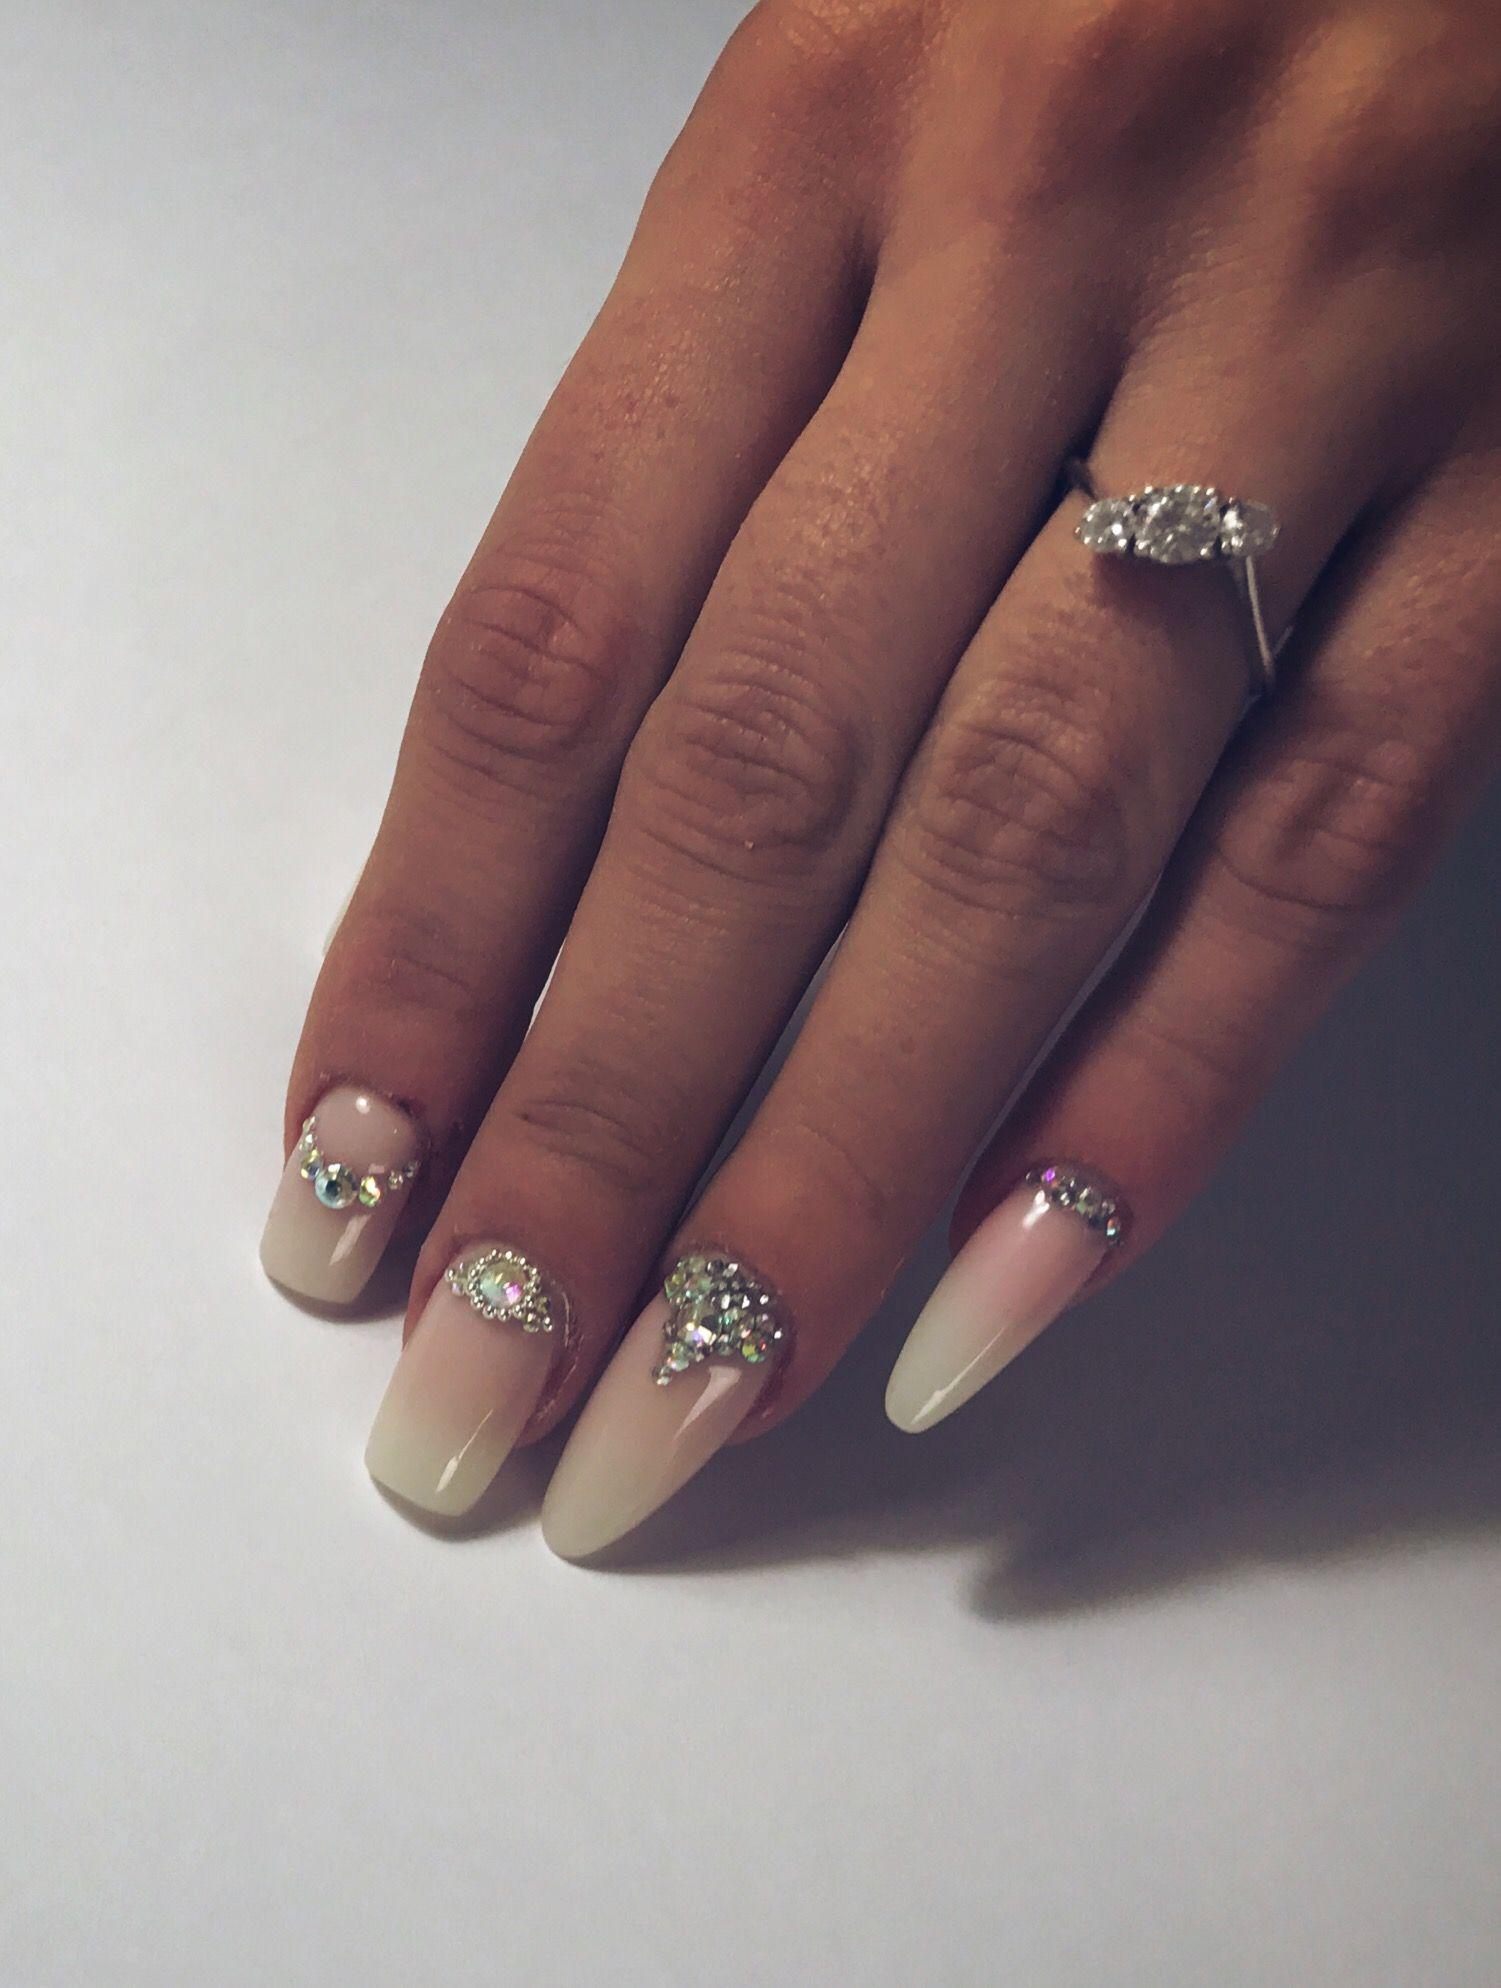 Baby #Boomer #Nails #Swarovski   Nails   Pinterest